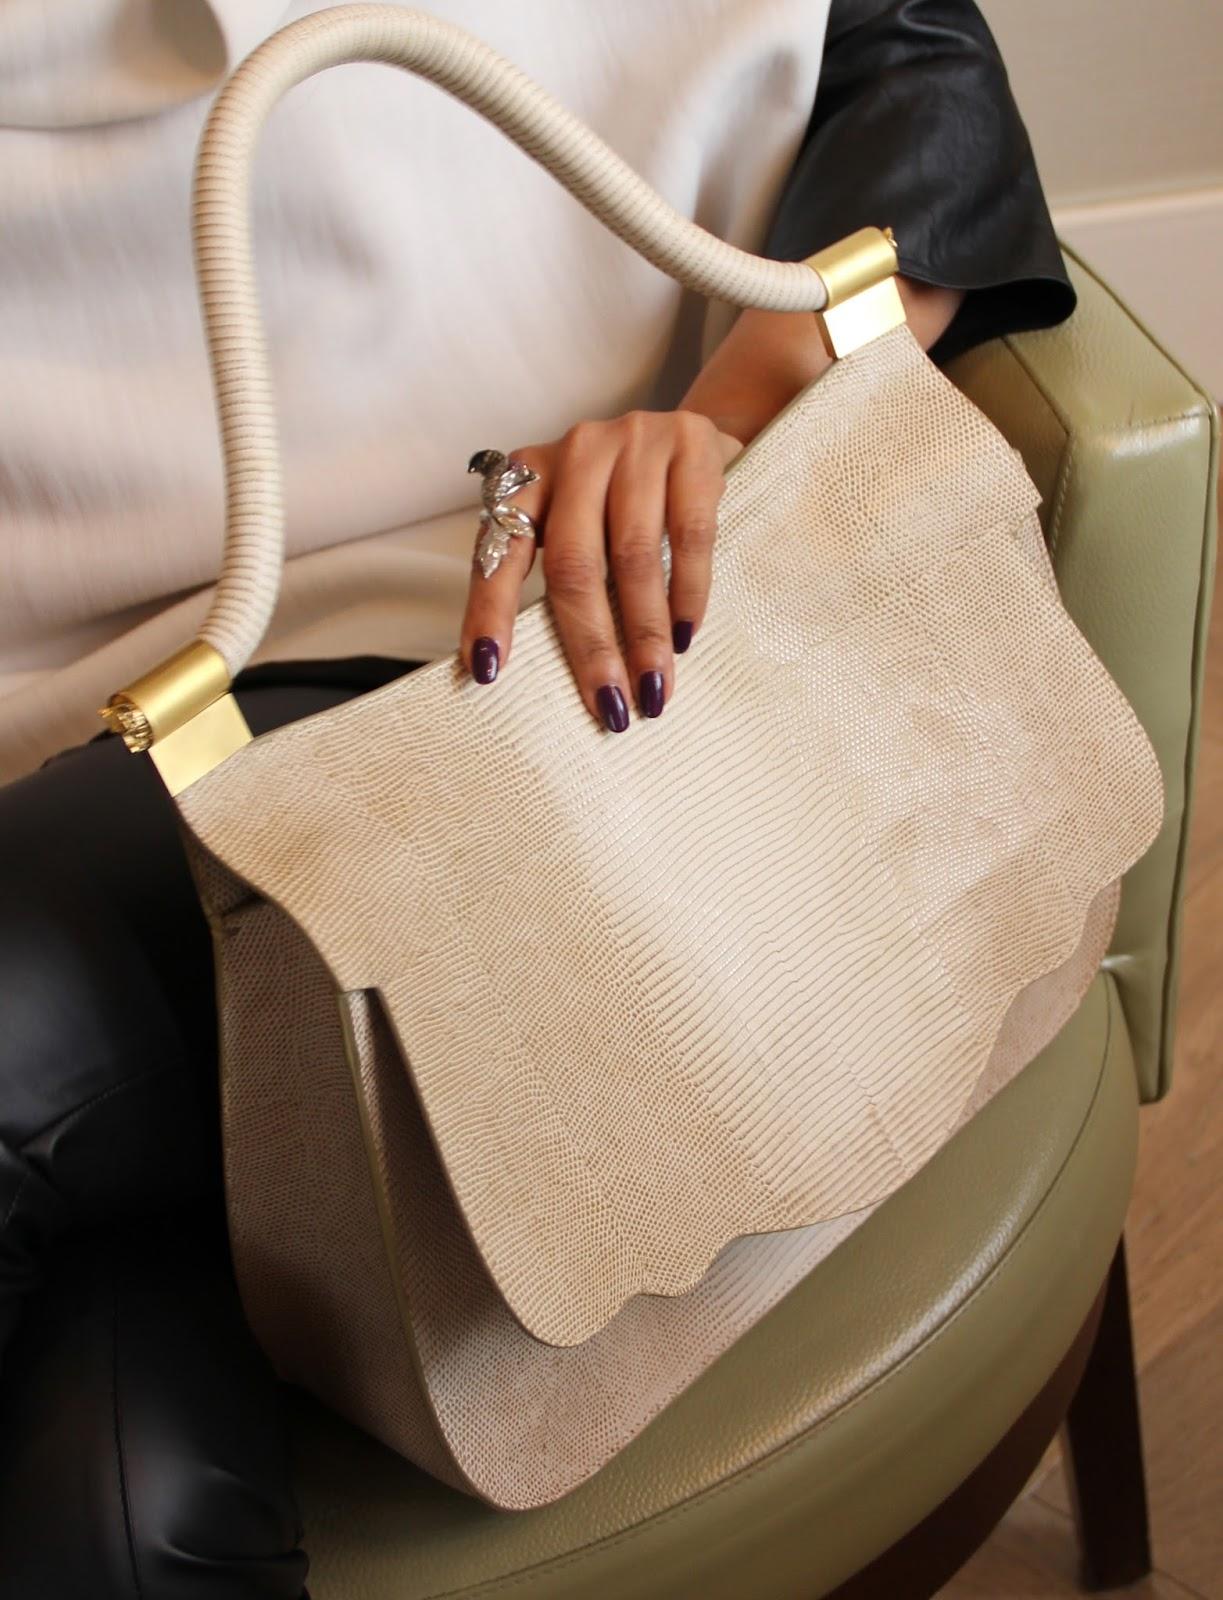 381dfe22922 THALÉ BLANC Luxury Handbags, Accessories Holiday 2013-Spring 2014